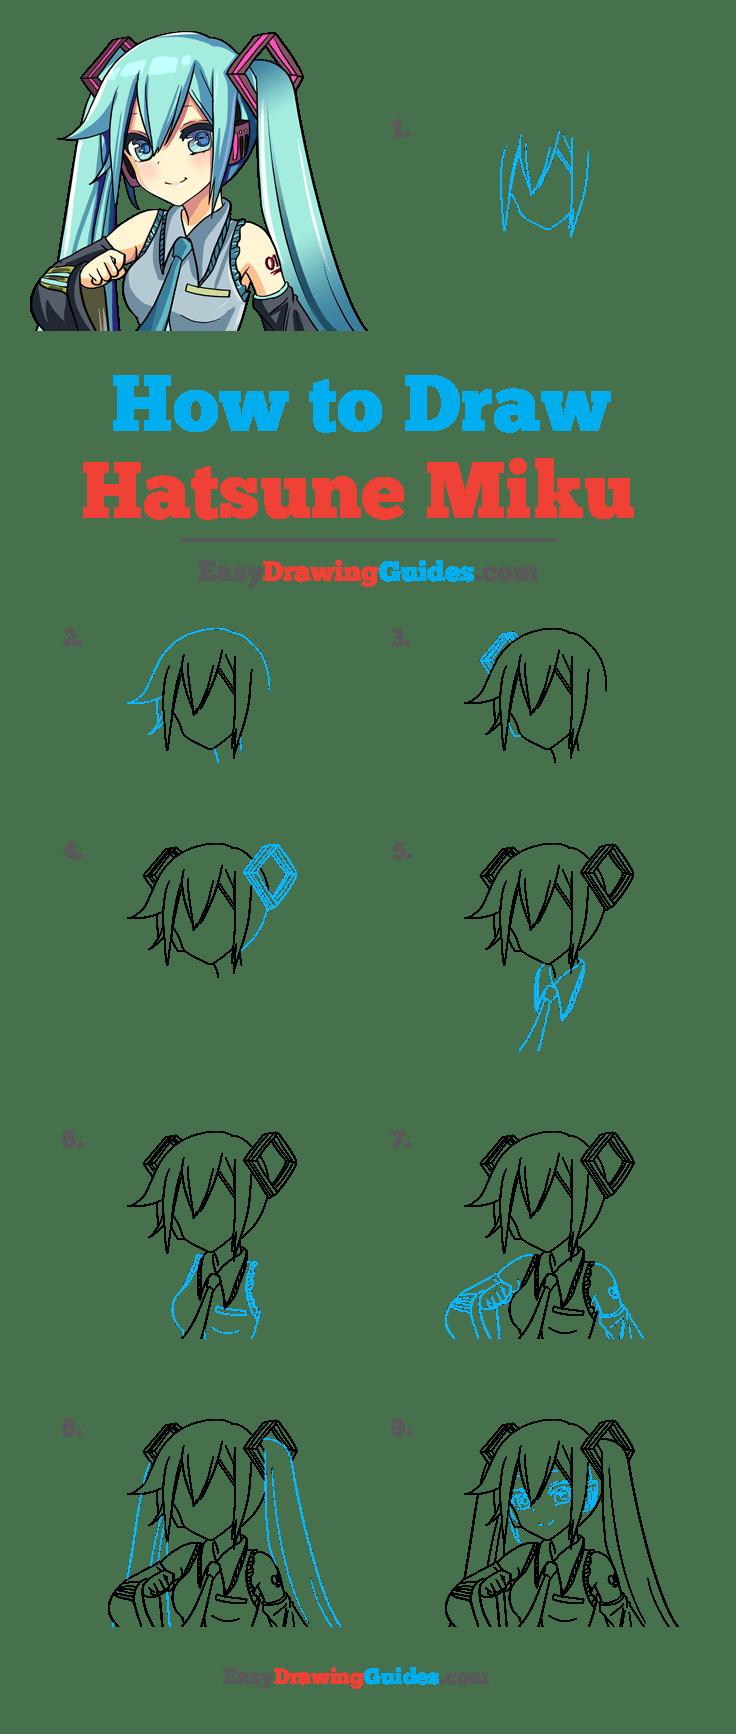 How to Draw Hatsune Miku